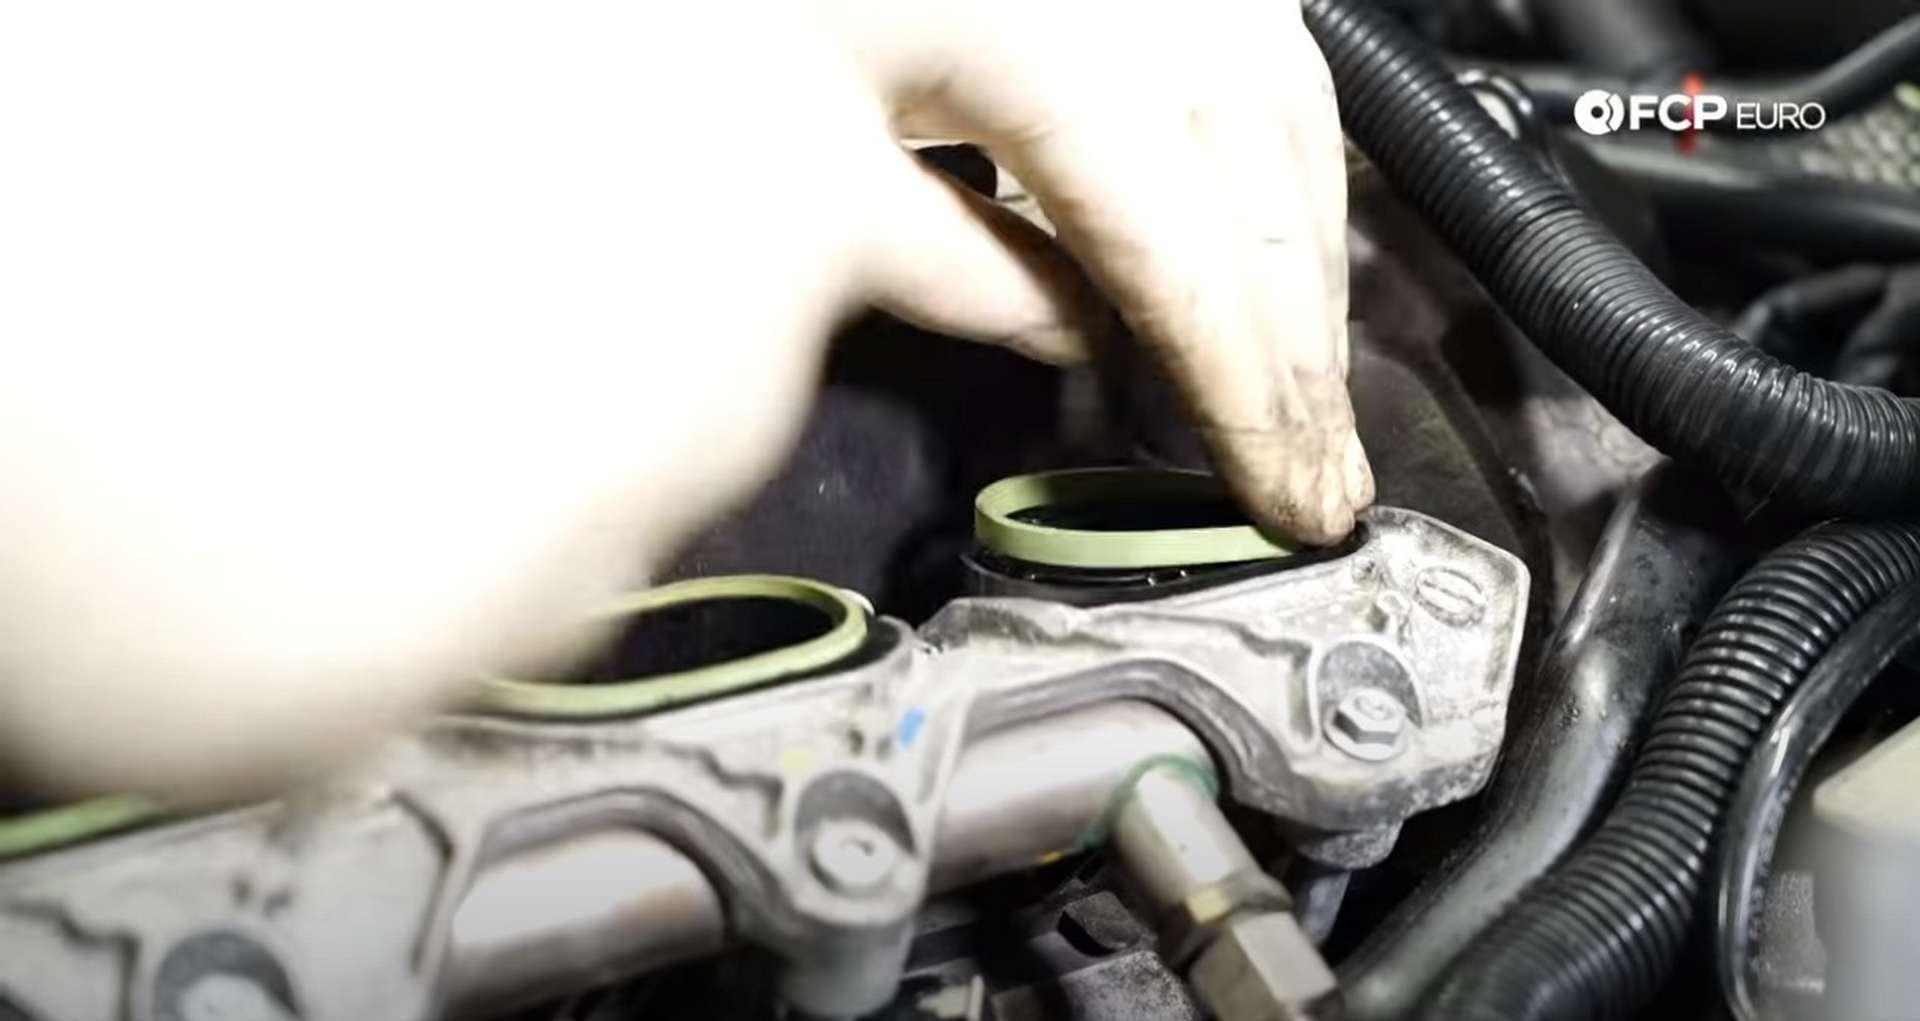 DIY Audi 3.0t Walnut Blasting Intake Valves installing the new supercharger gaskets